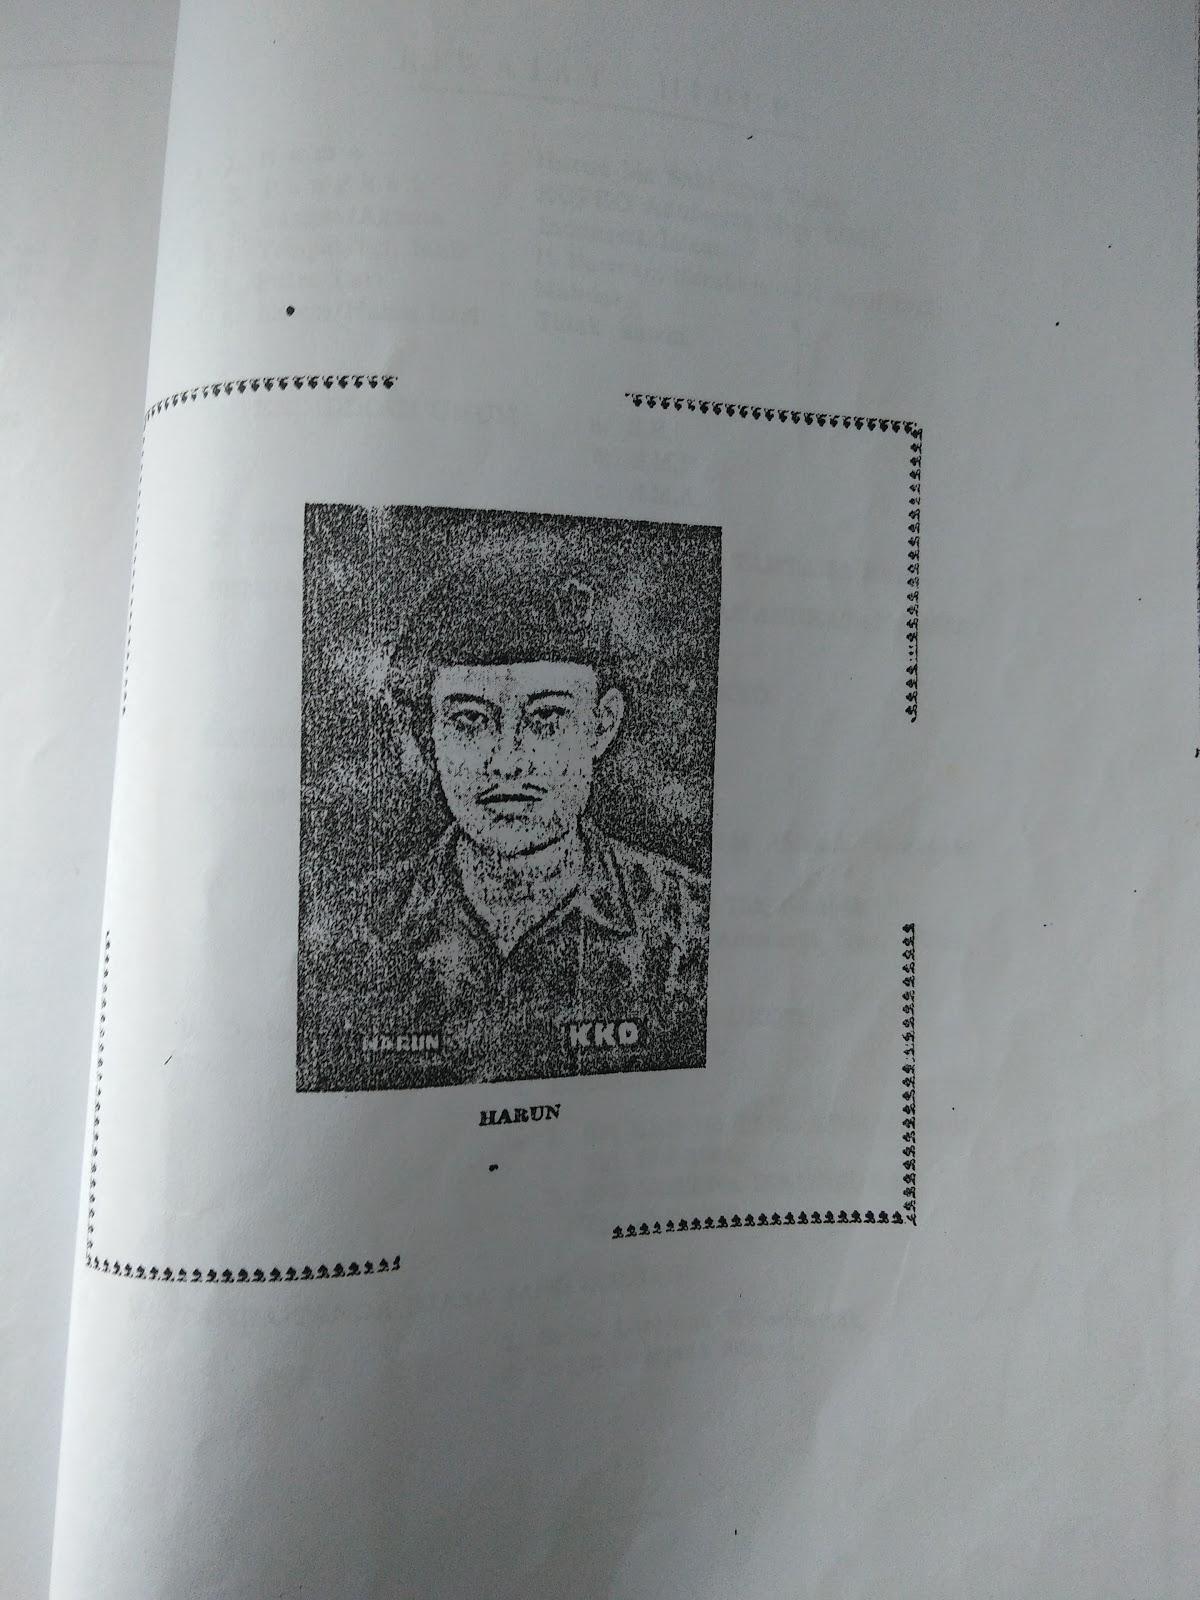 Proposal Penelitian Patriot Bangsa Dari Kota Perwira Biografi Usman Janatin 1943 1968 Arif Saefudin